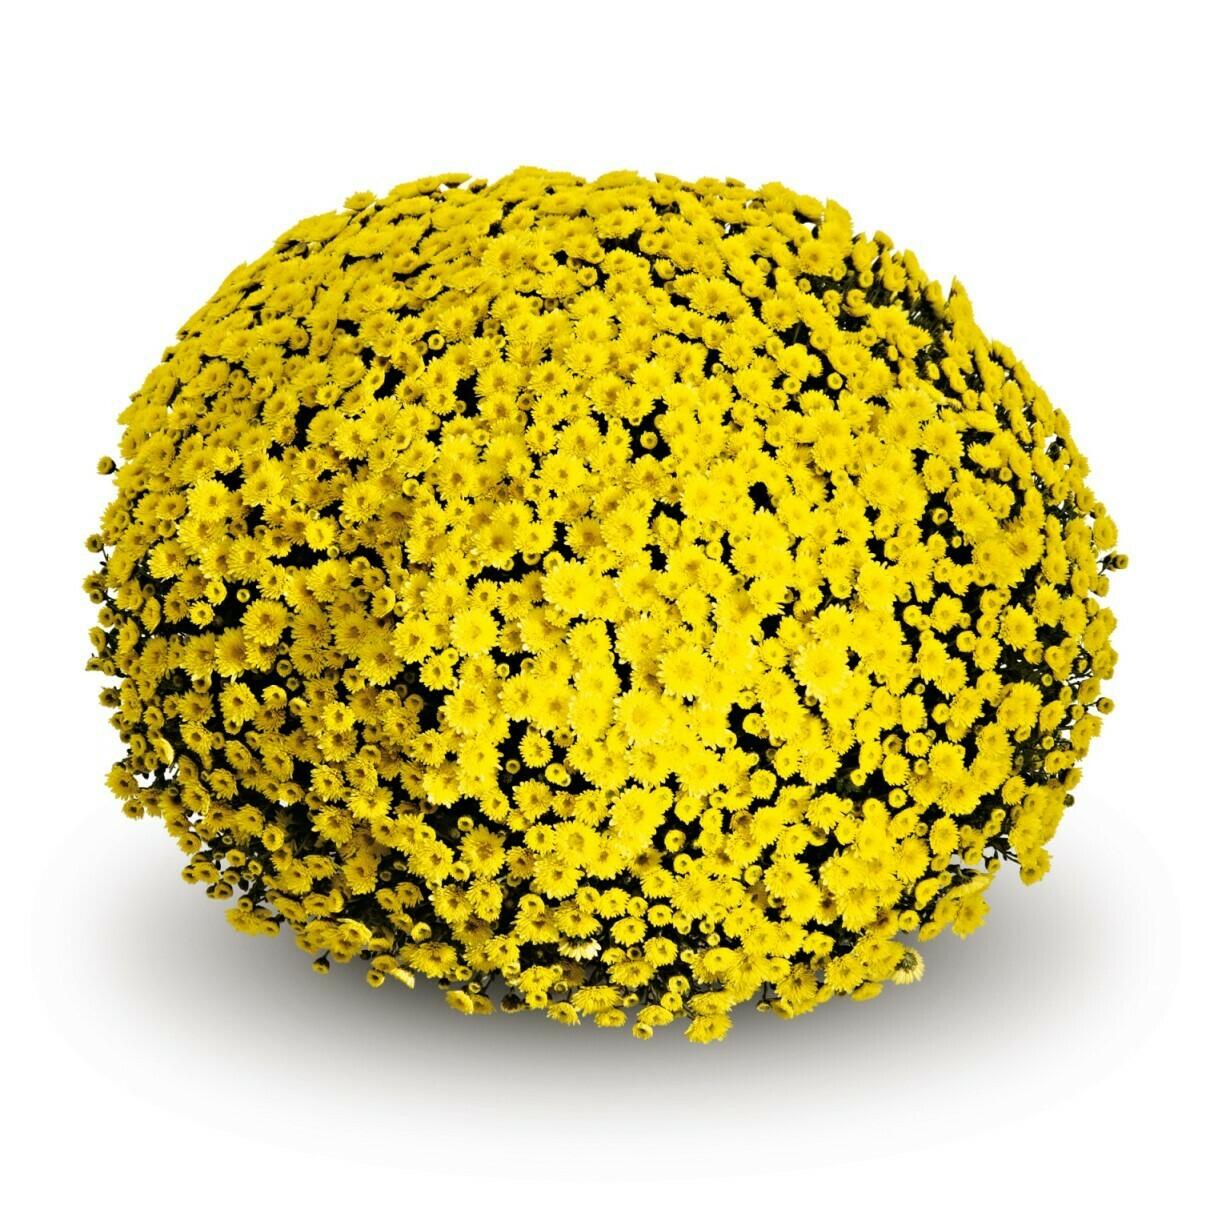 Staviski Yellow FT 23-31